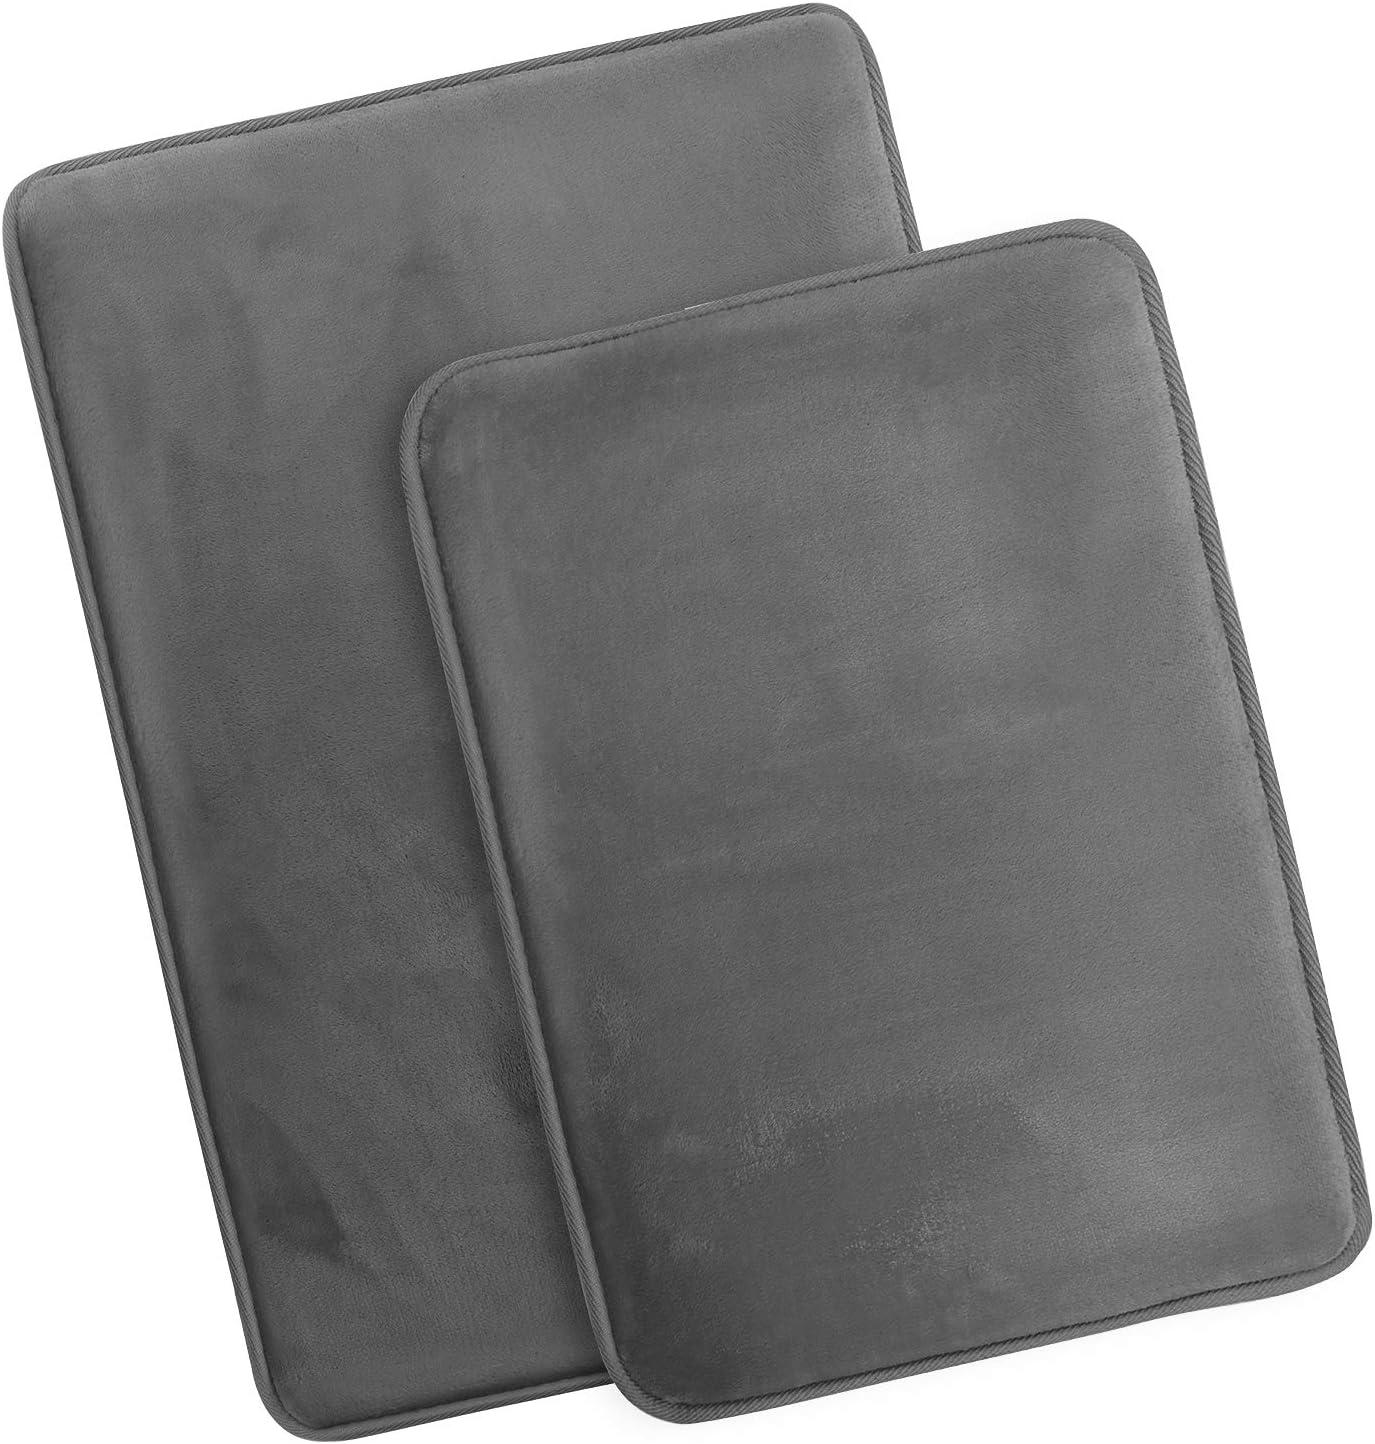 Clara Clark Memory Foam Bath Mat Ultra Soft Non Slip and Absorbent Bathroom Rug, Set of 2 - Small/Large - Grey